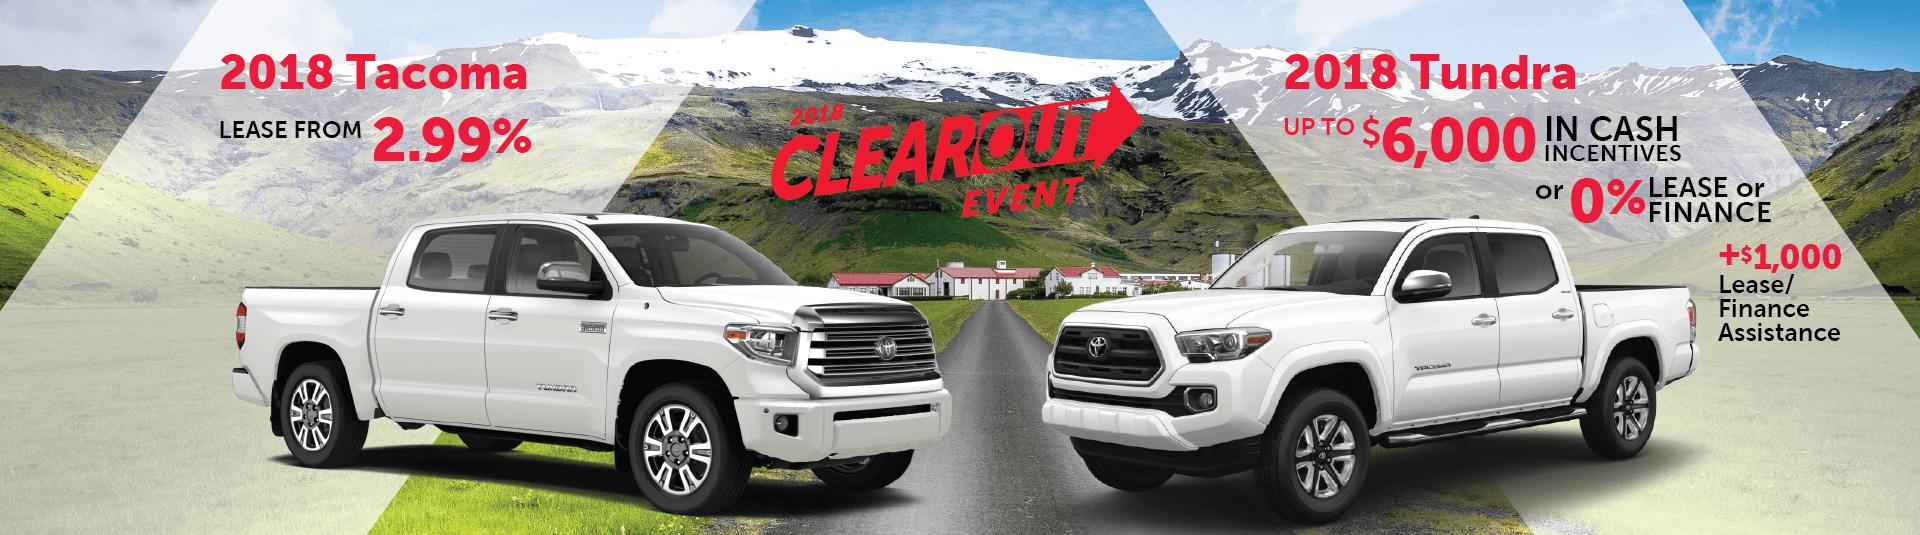 2018 Toyota Tundra and Tacoma Offers